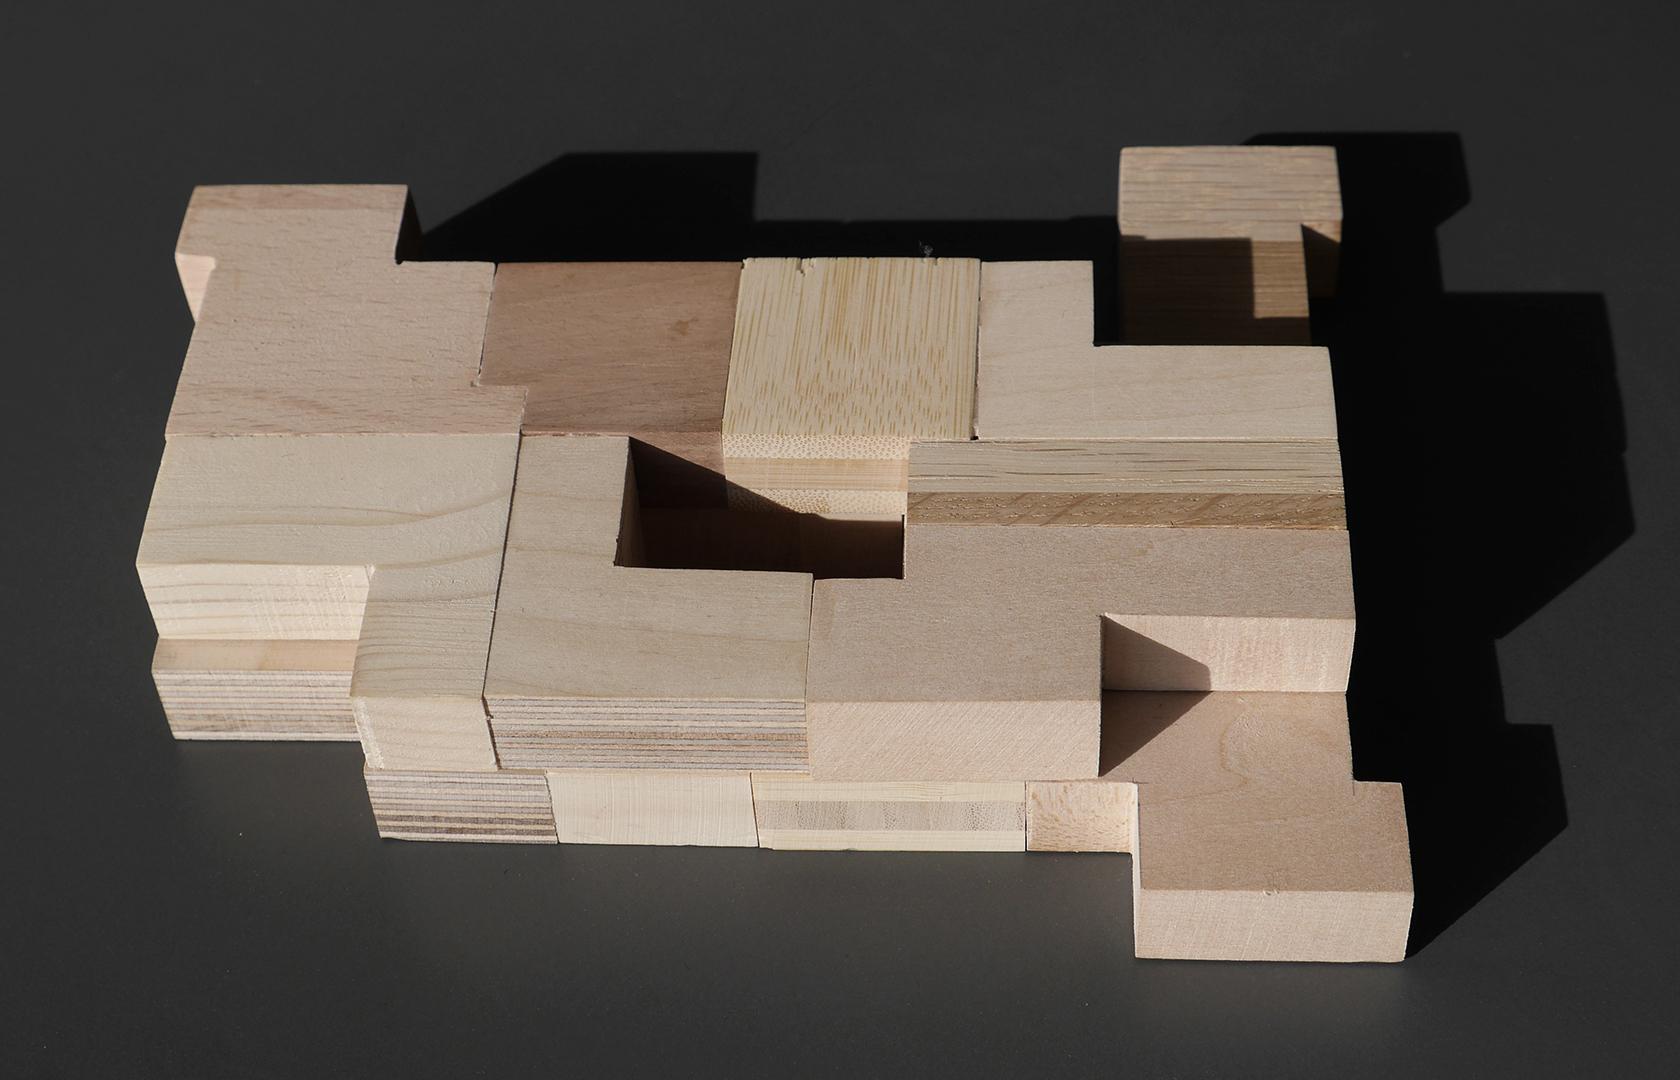 wood-model_1_1680x1080_16zu9